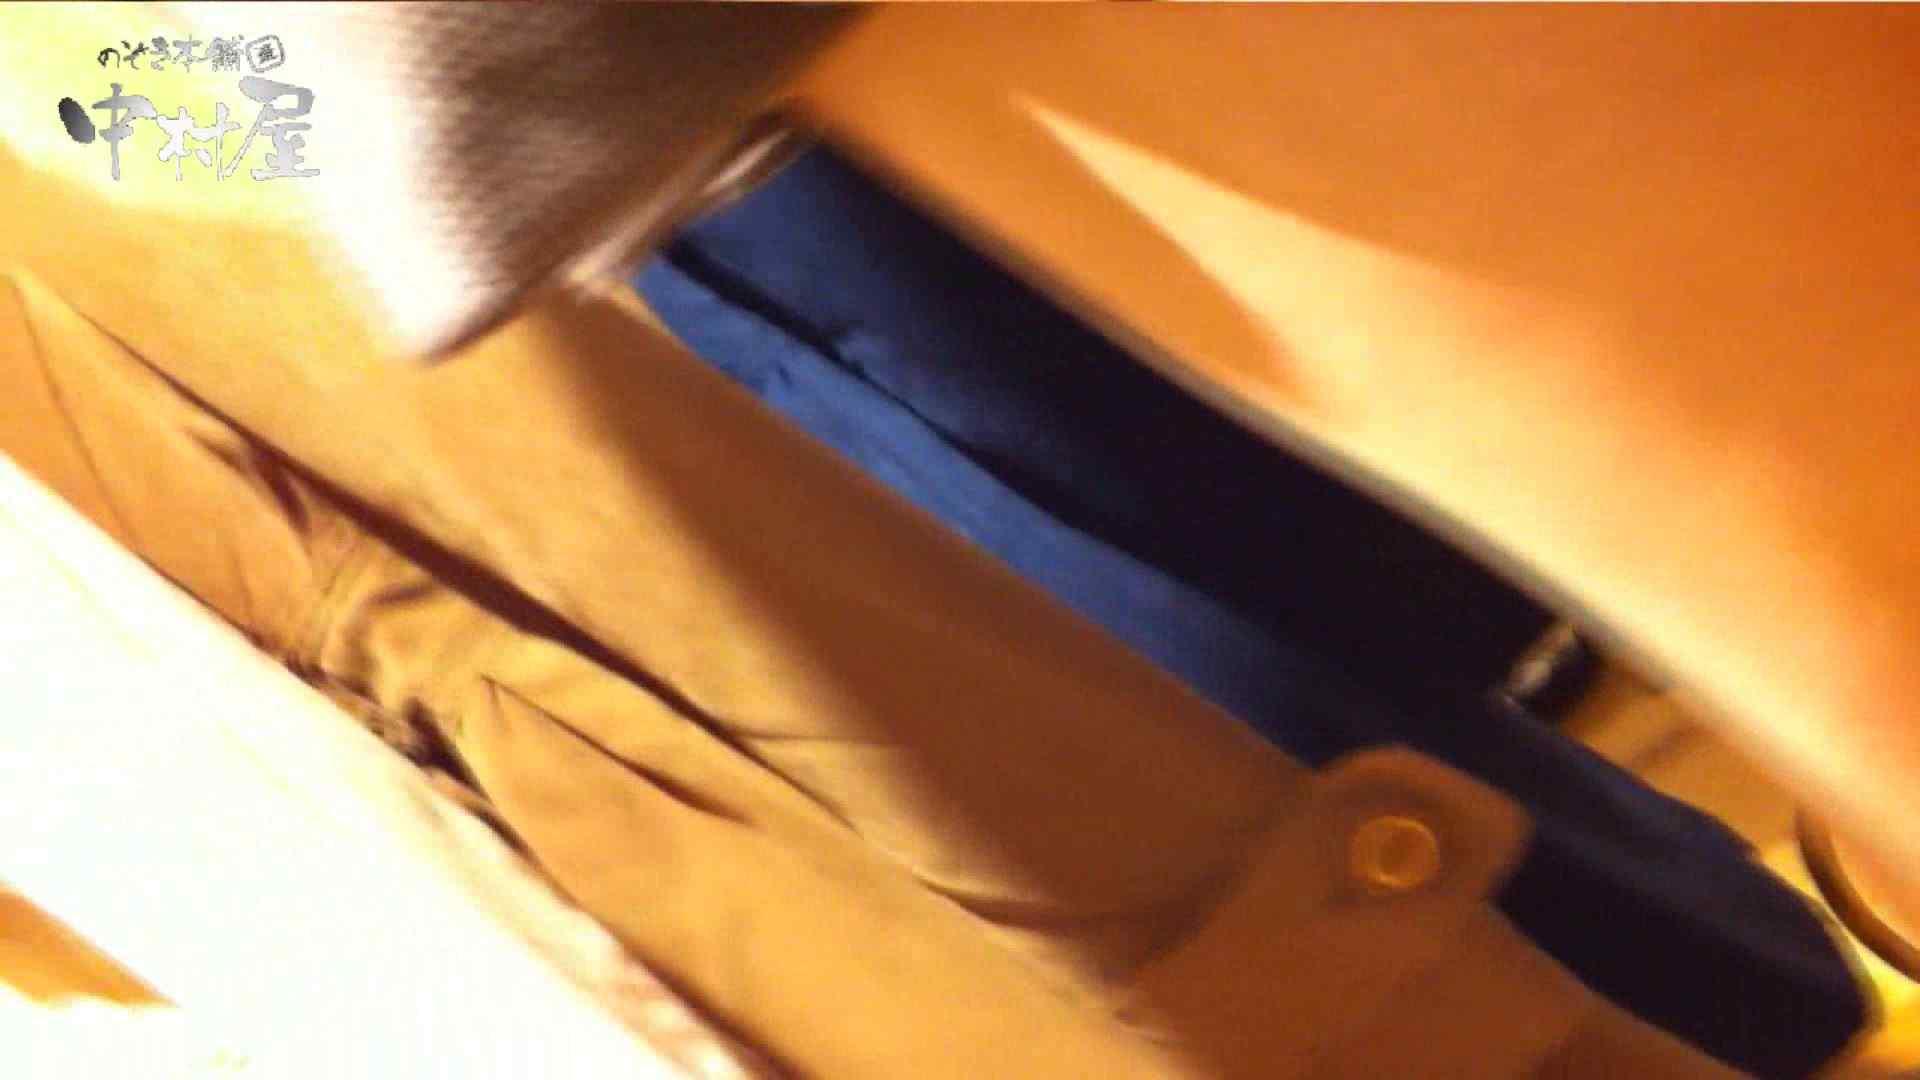 vol.45 可愛いカリスマ店員限定‼胸チラ&パンチラ 食い込みミッキーマウス!  21枚